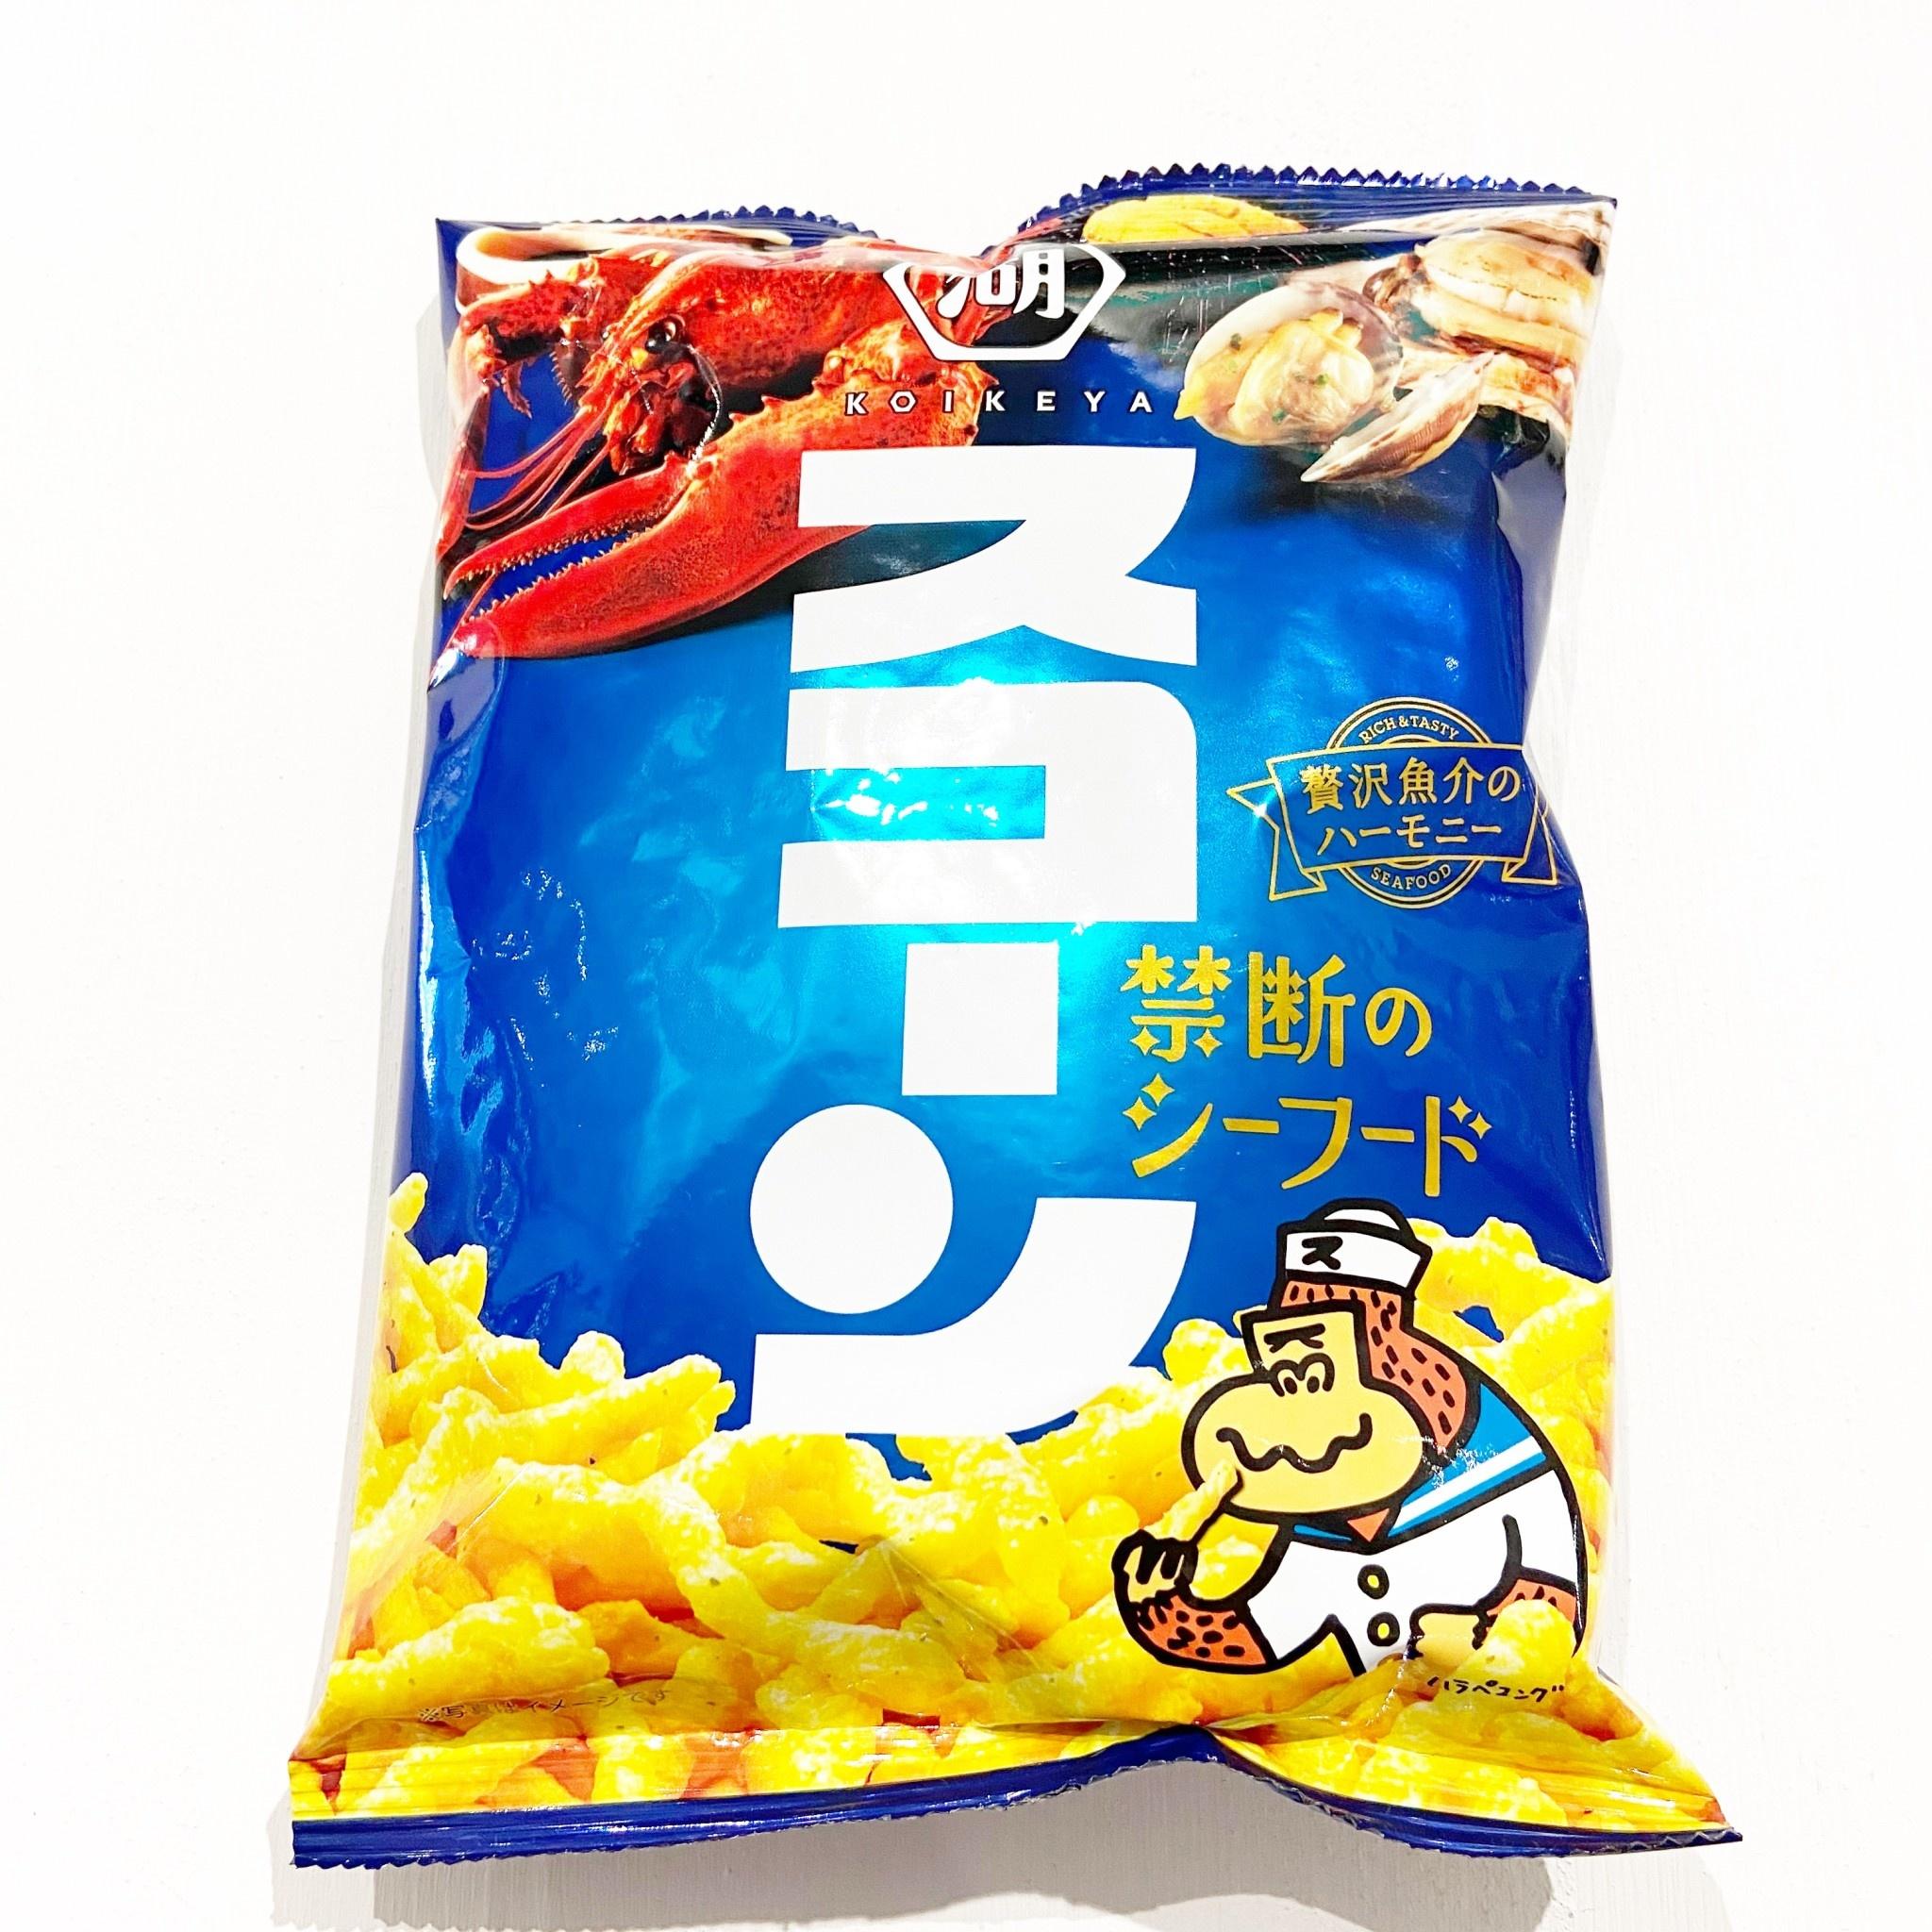 KOIKEYA Corn Sticks Seafood Flavor